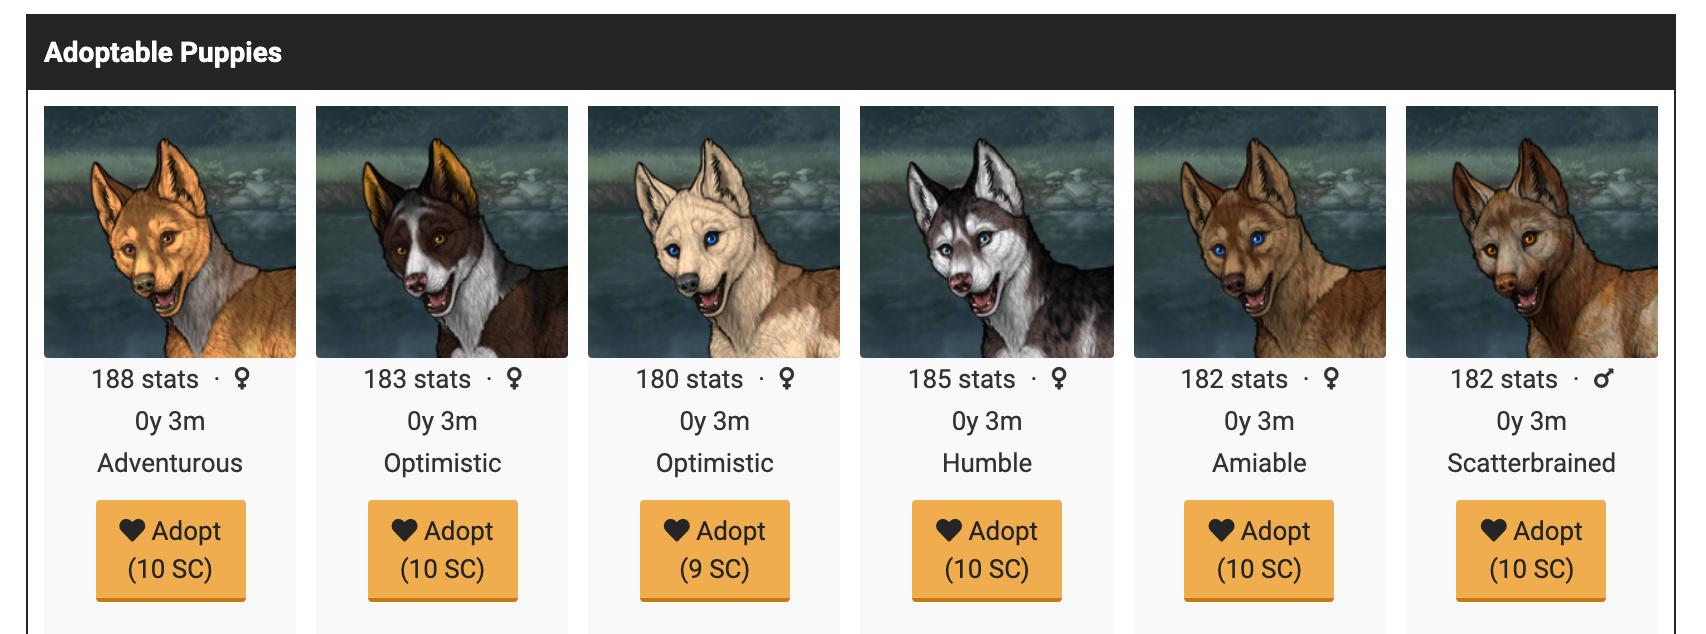 Adoptable Puppies Screenshot